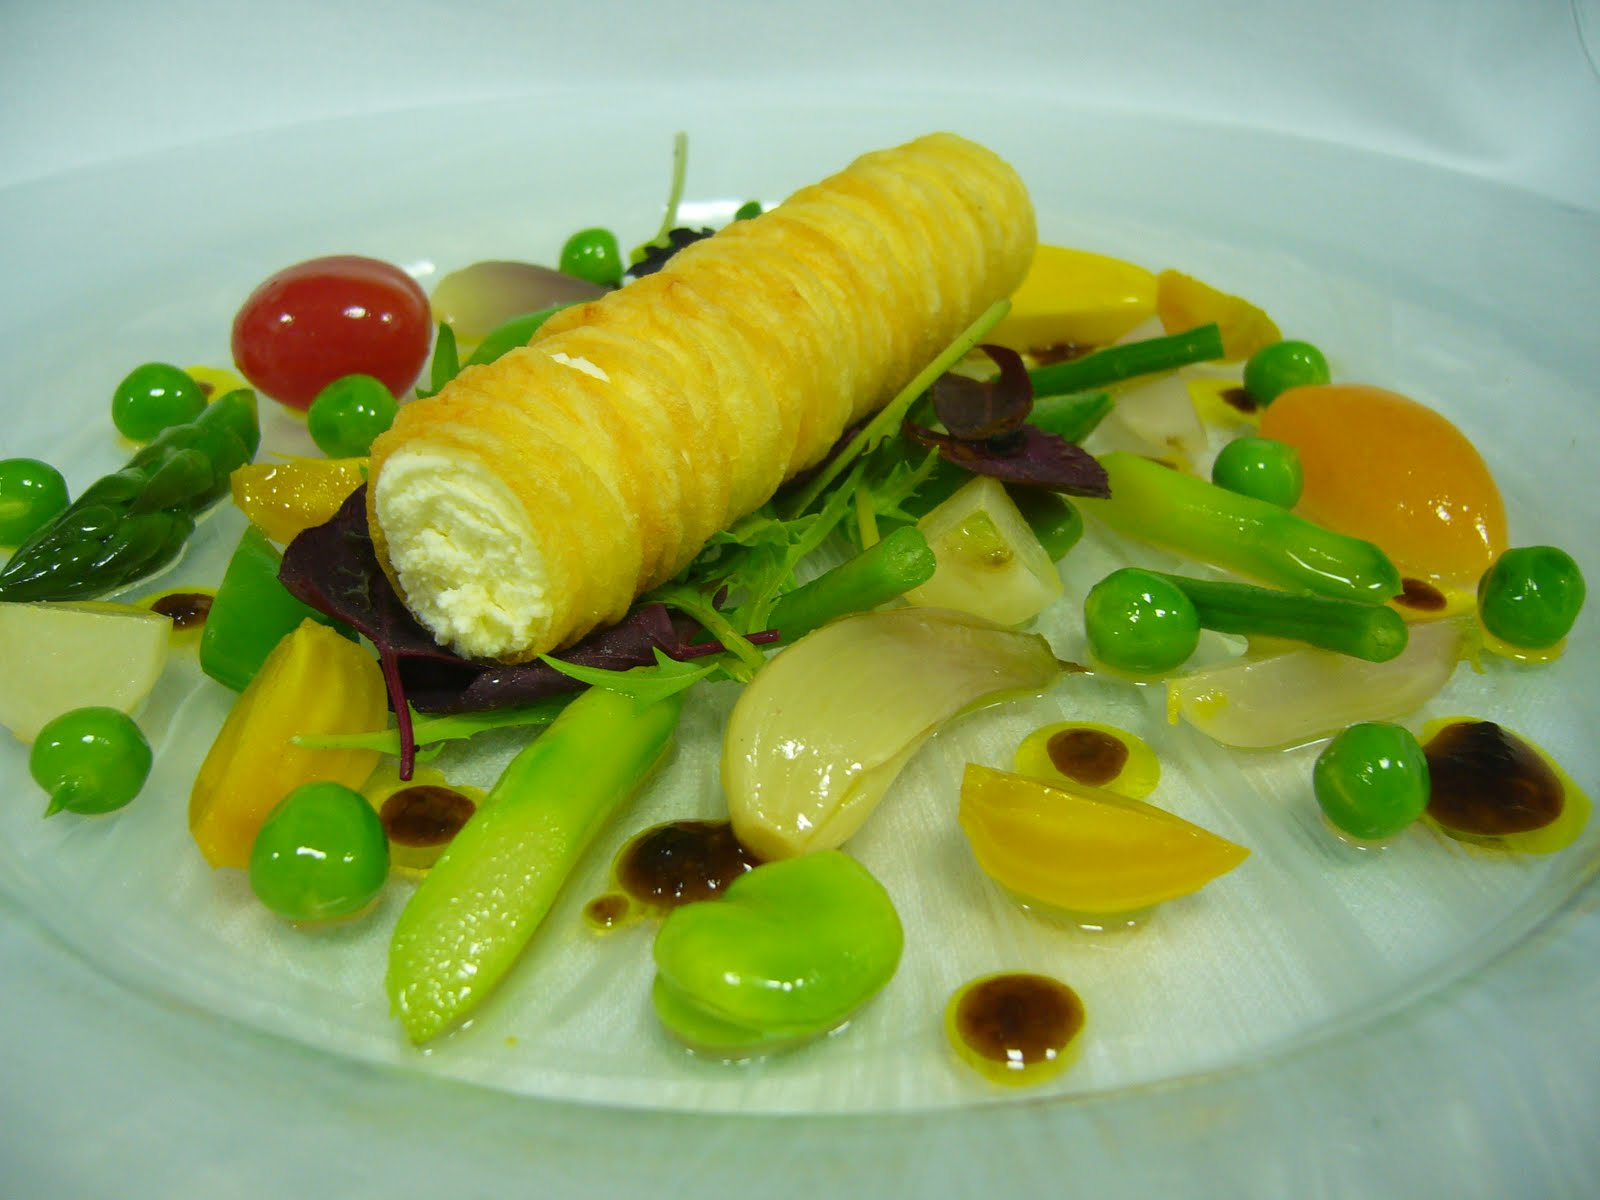 Asparagus Recipes Bacon Wrapped Cream Cheese